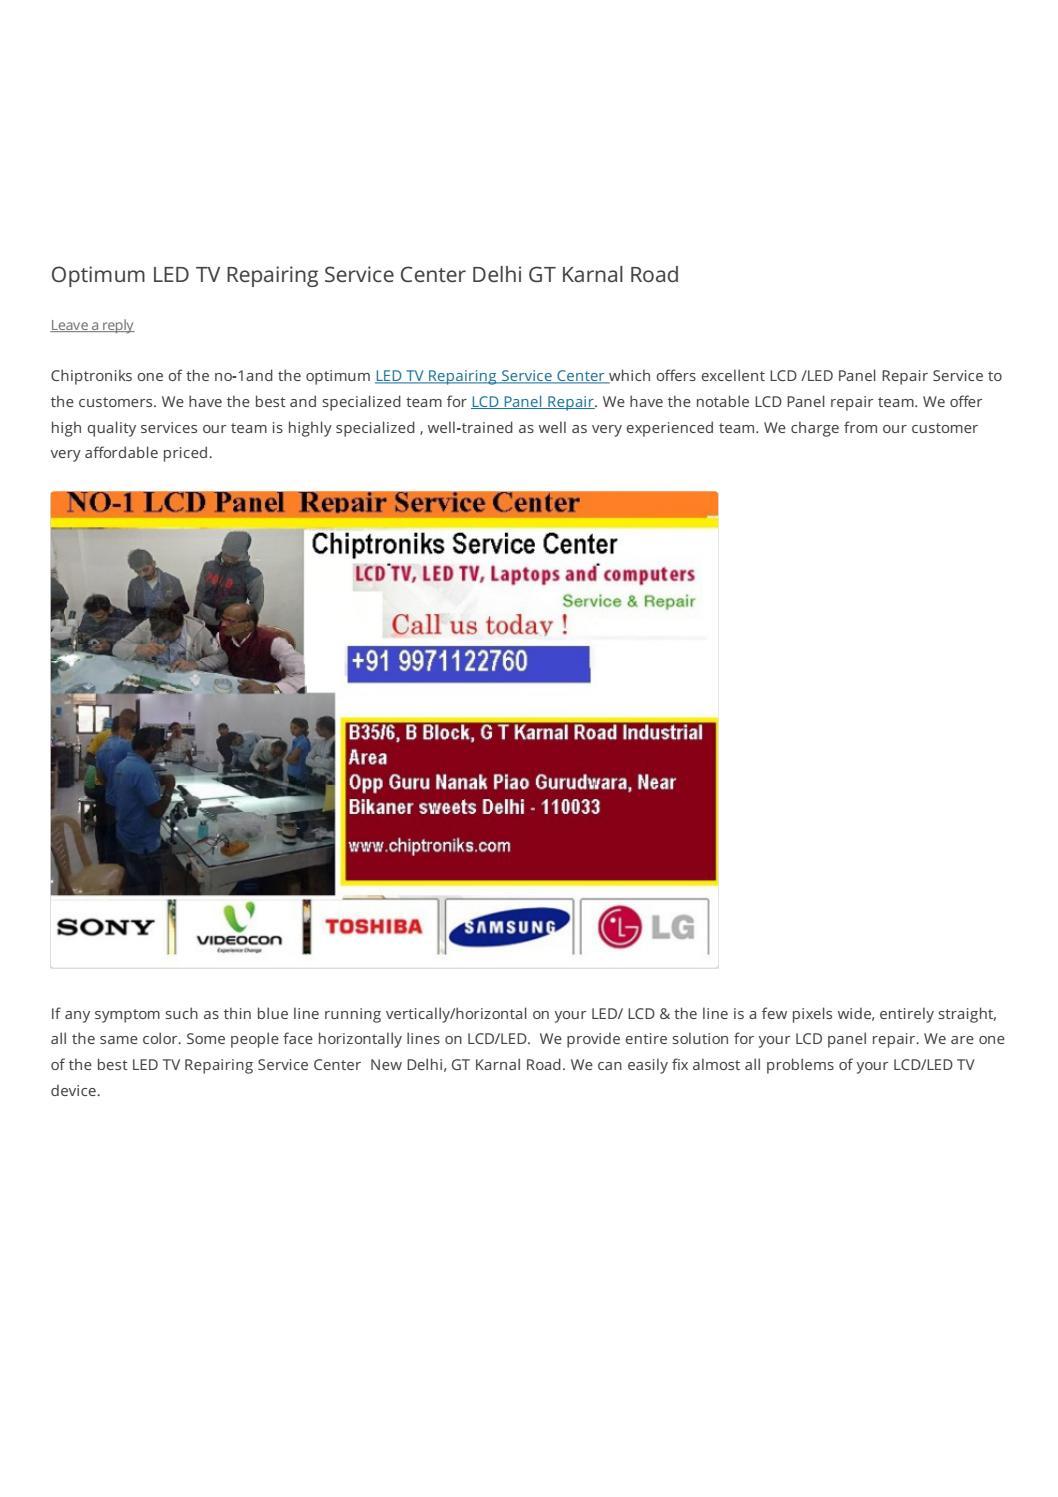 Brilliant LED TV Repairing Service Center GT Karnal Road Delhi by